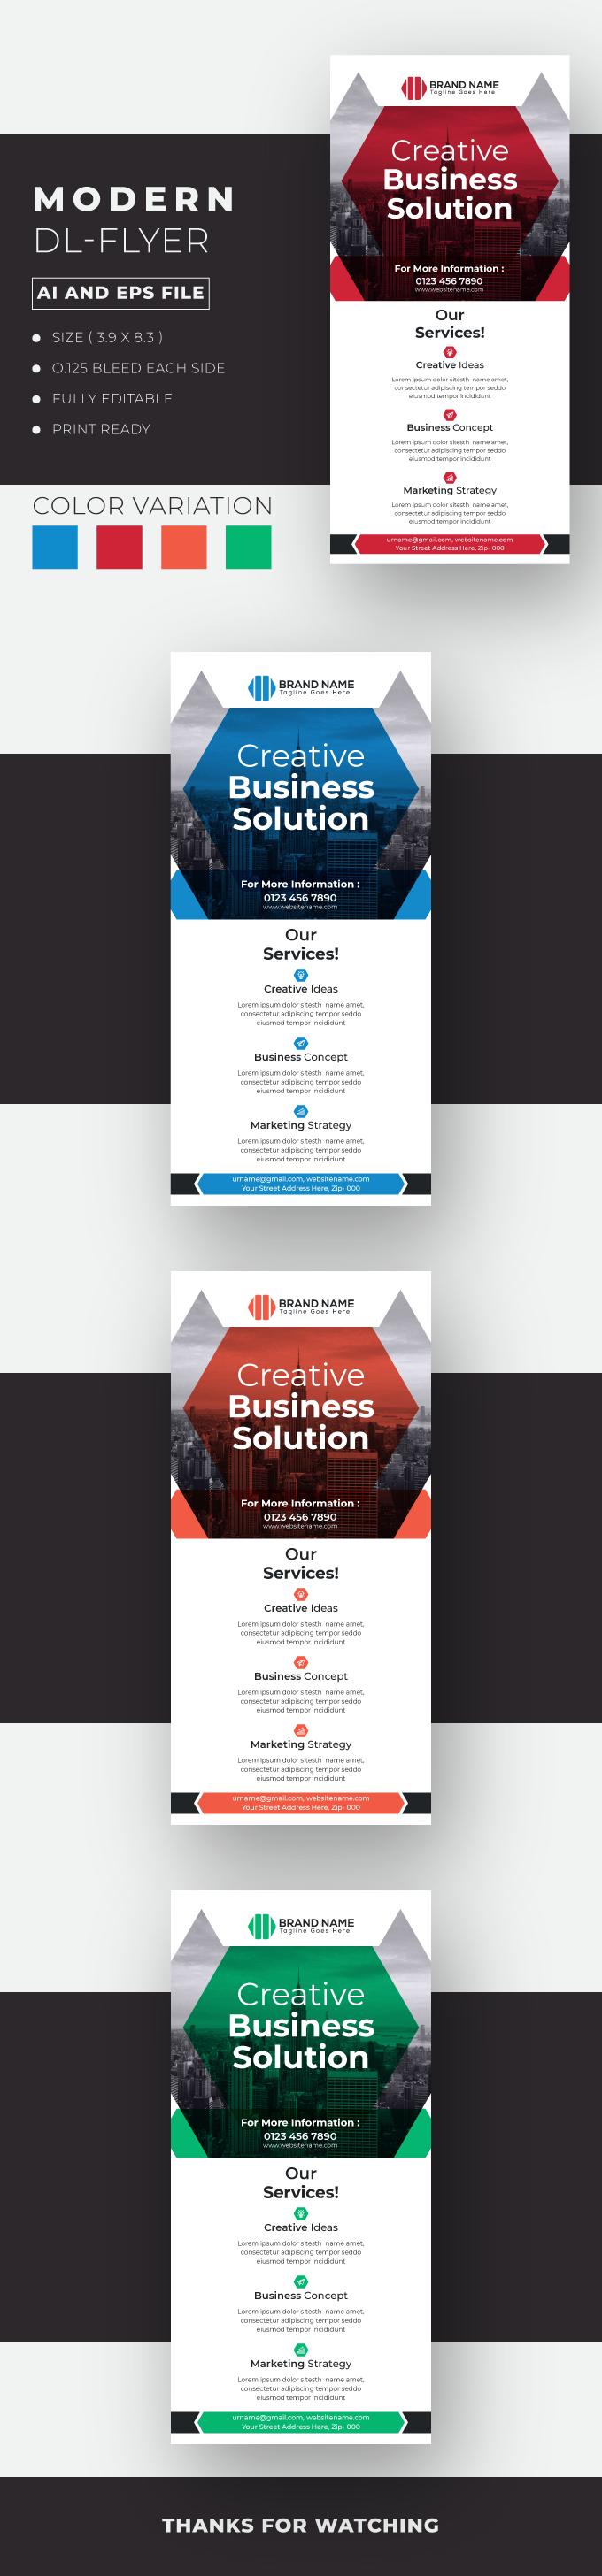 Modern Business DL-Flyer